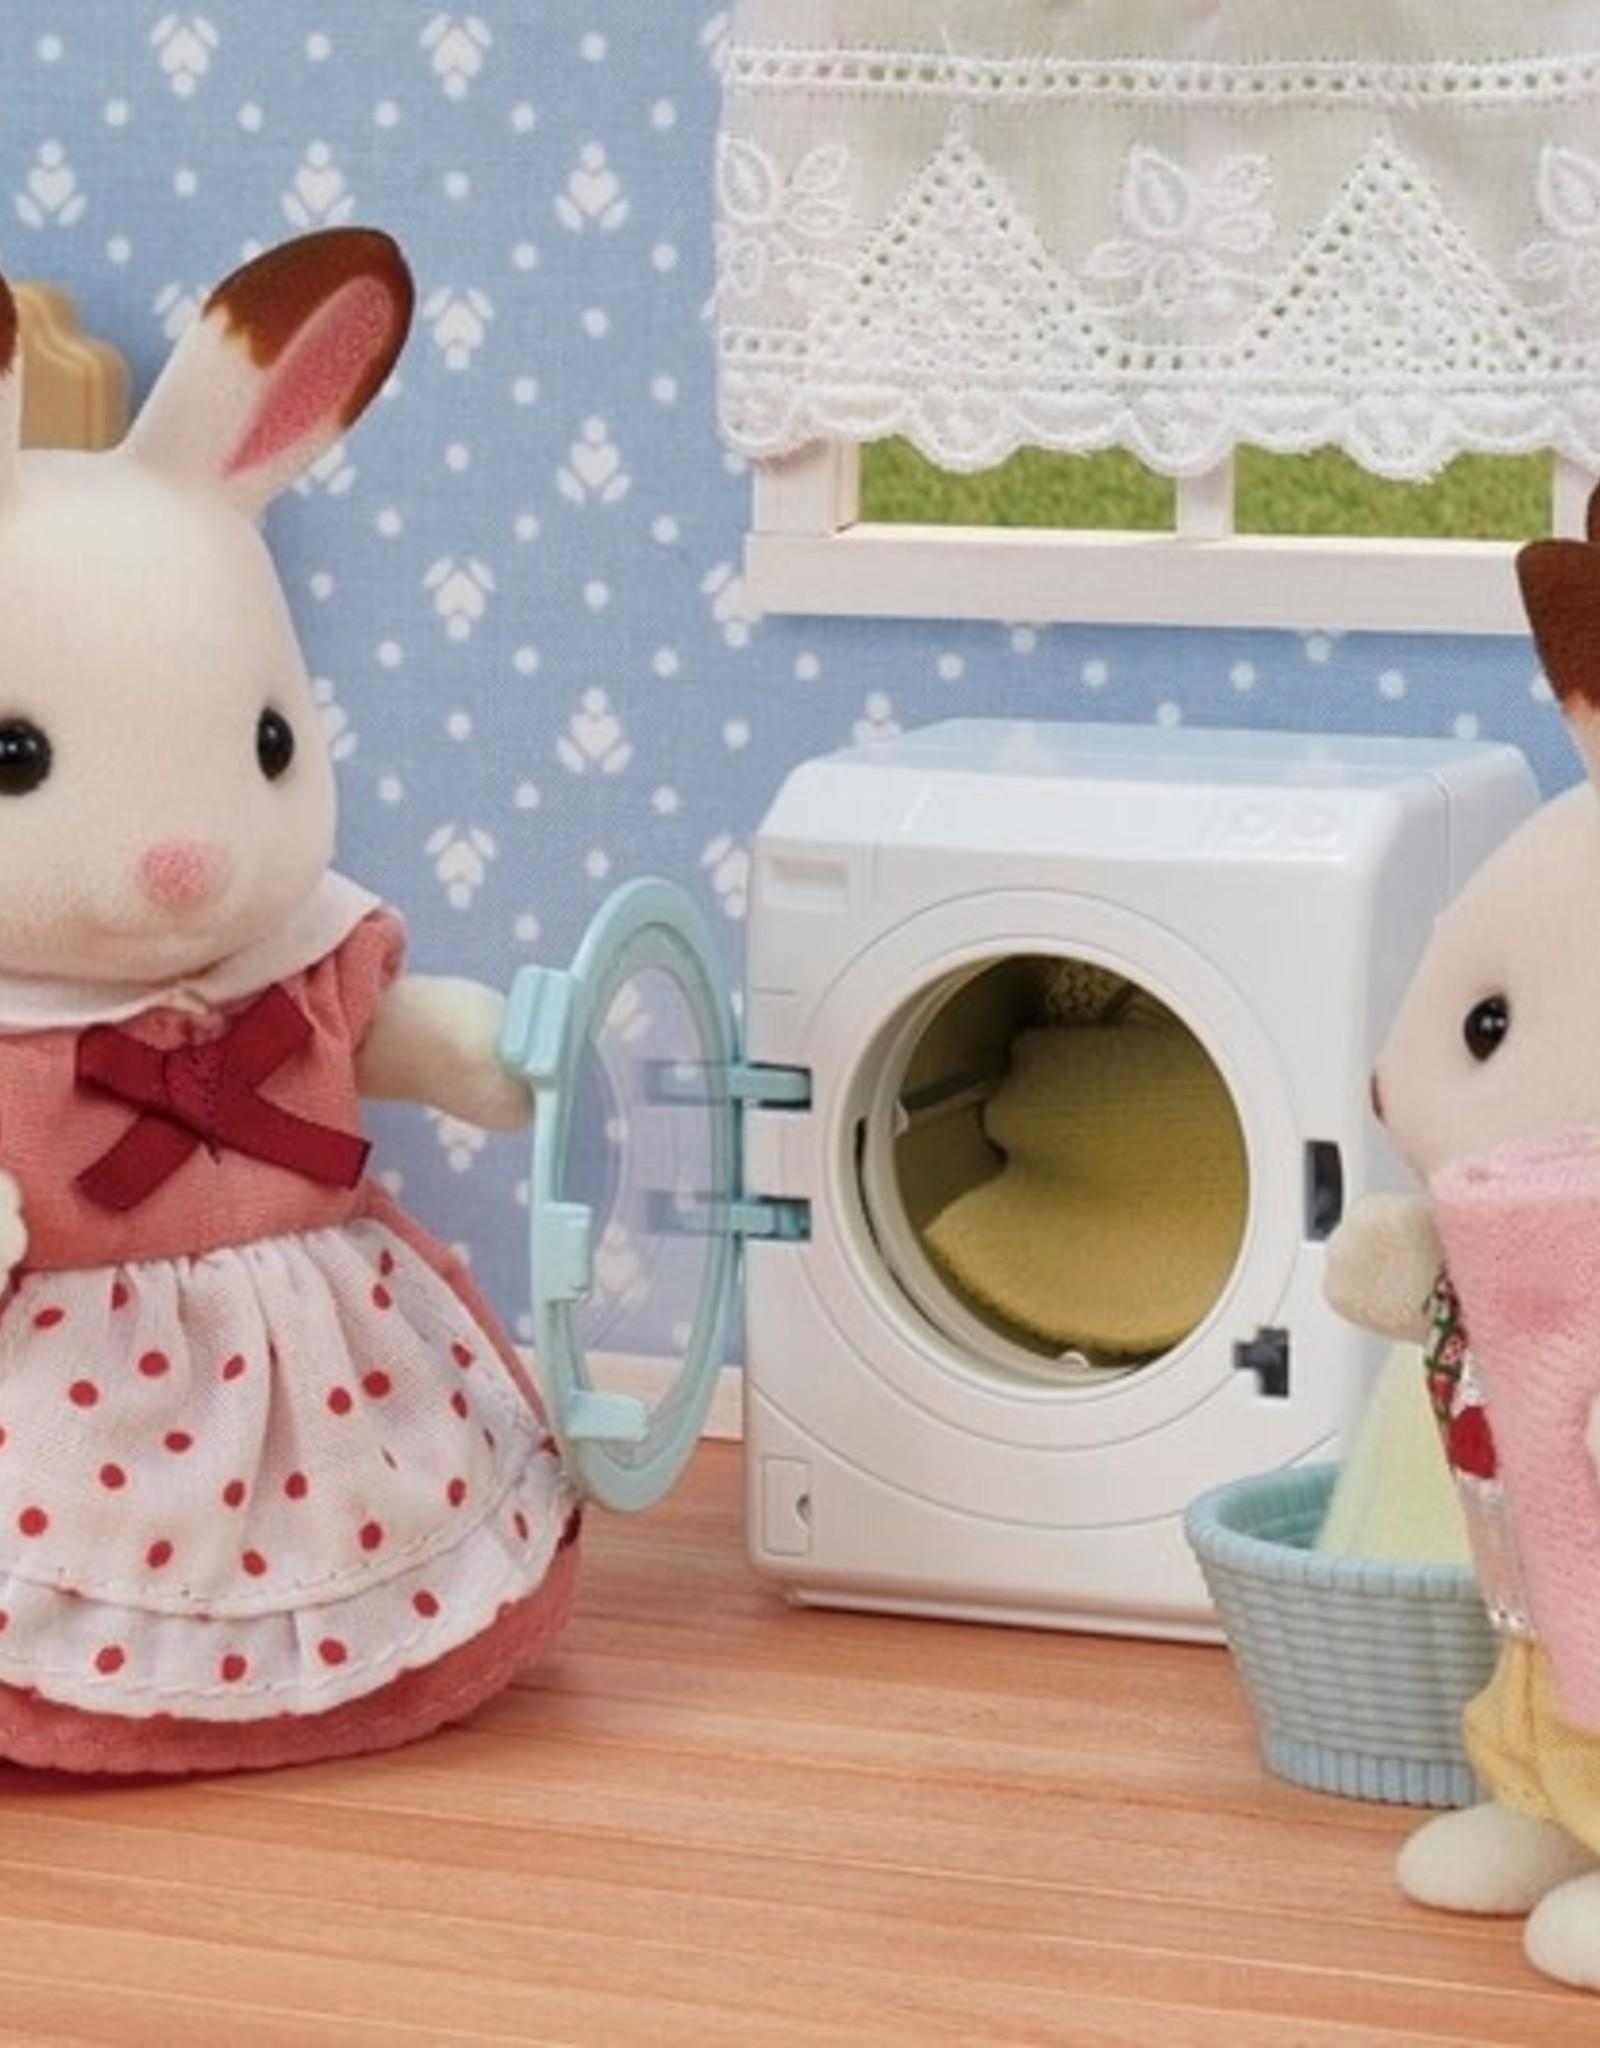 Calico Critters CC Laundry & Vacuum Cleaner